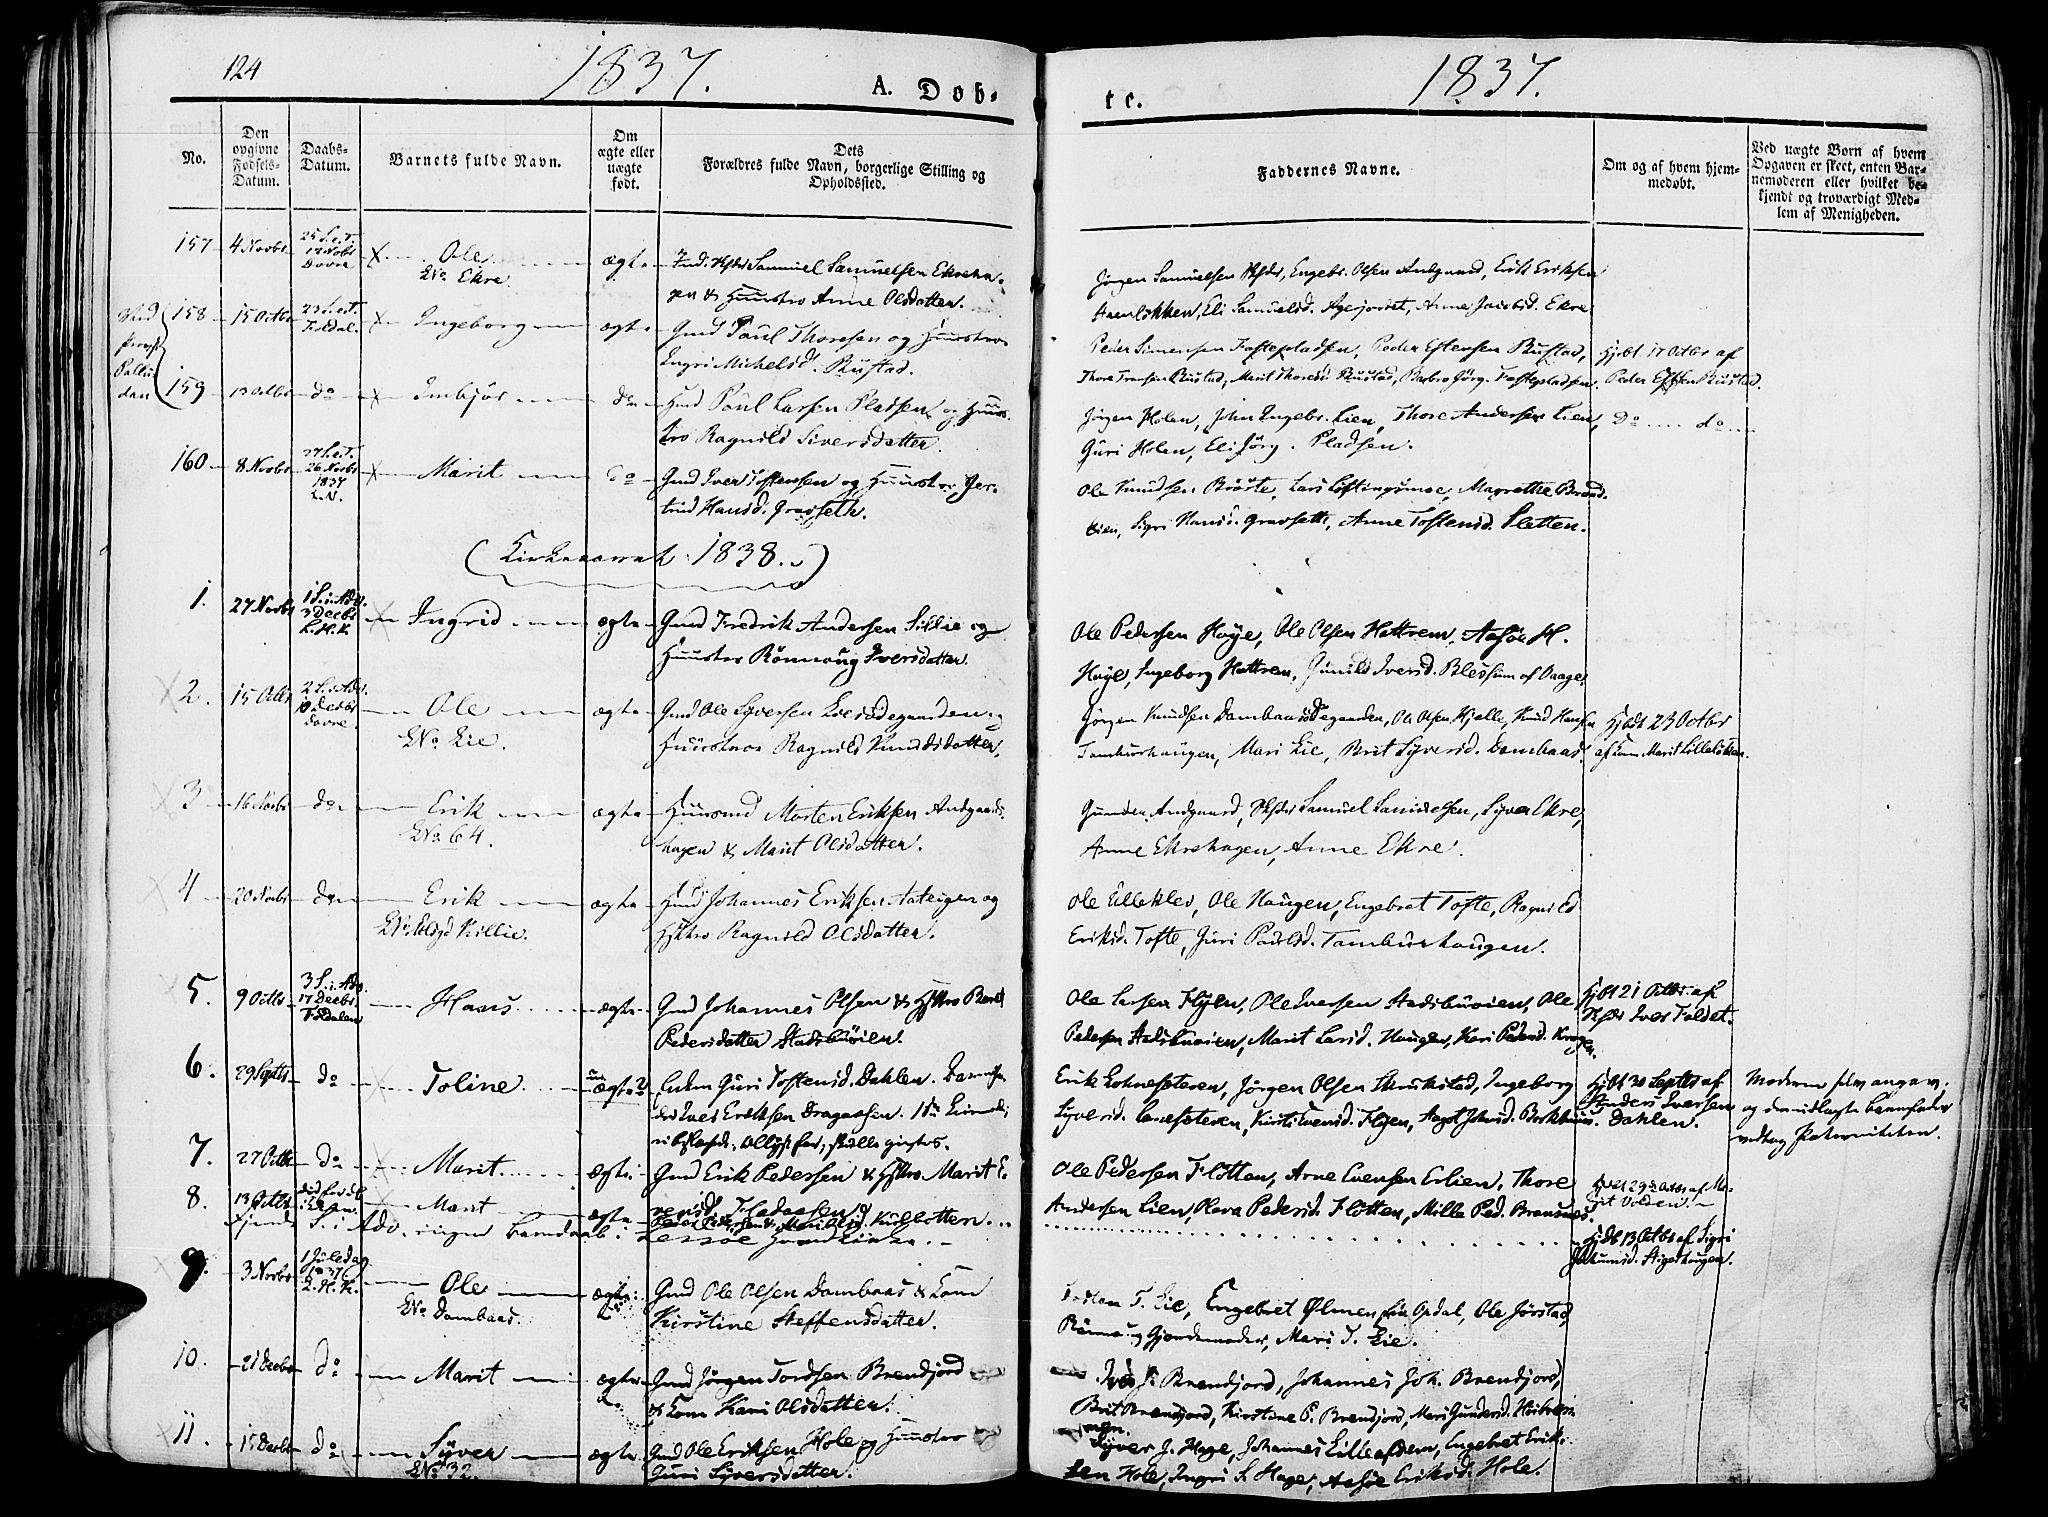 SAH, Lesja prestekontor, Ministerialbok nr. 5, 1830-1842, s. 124